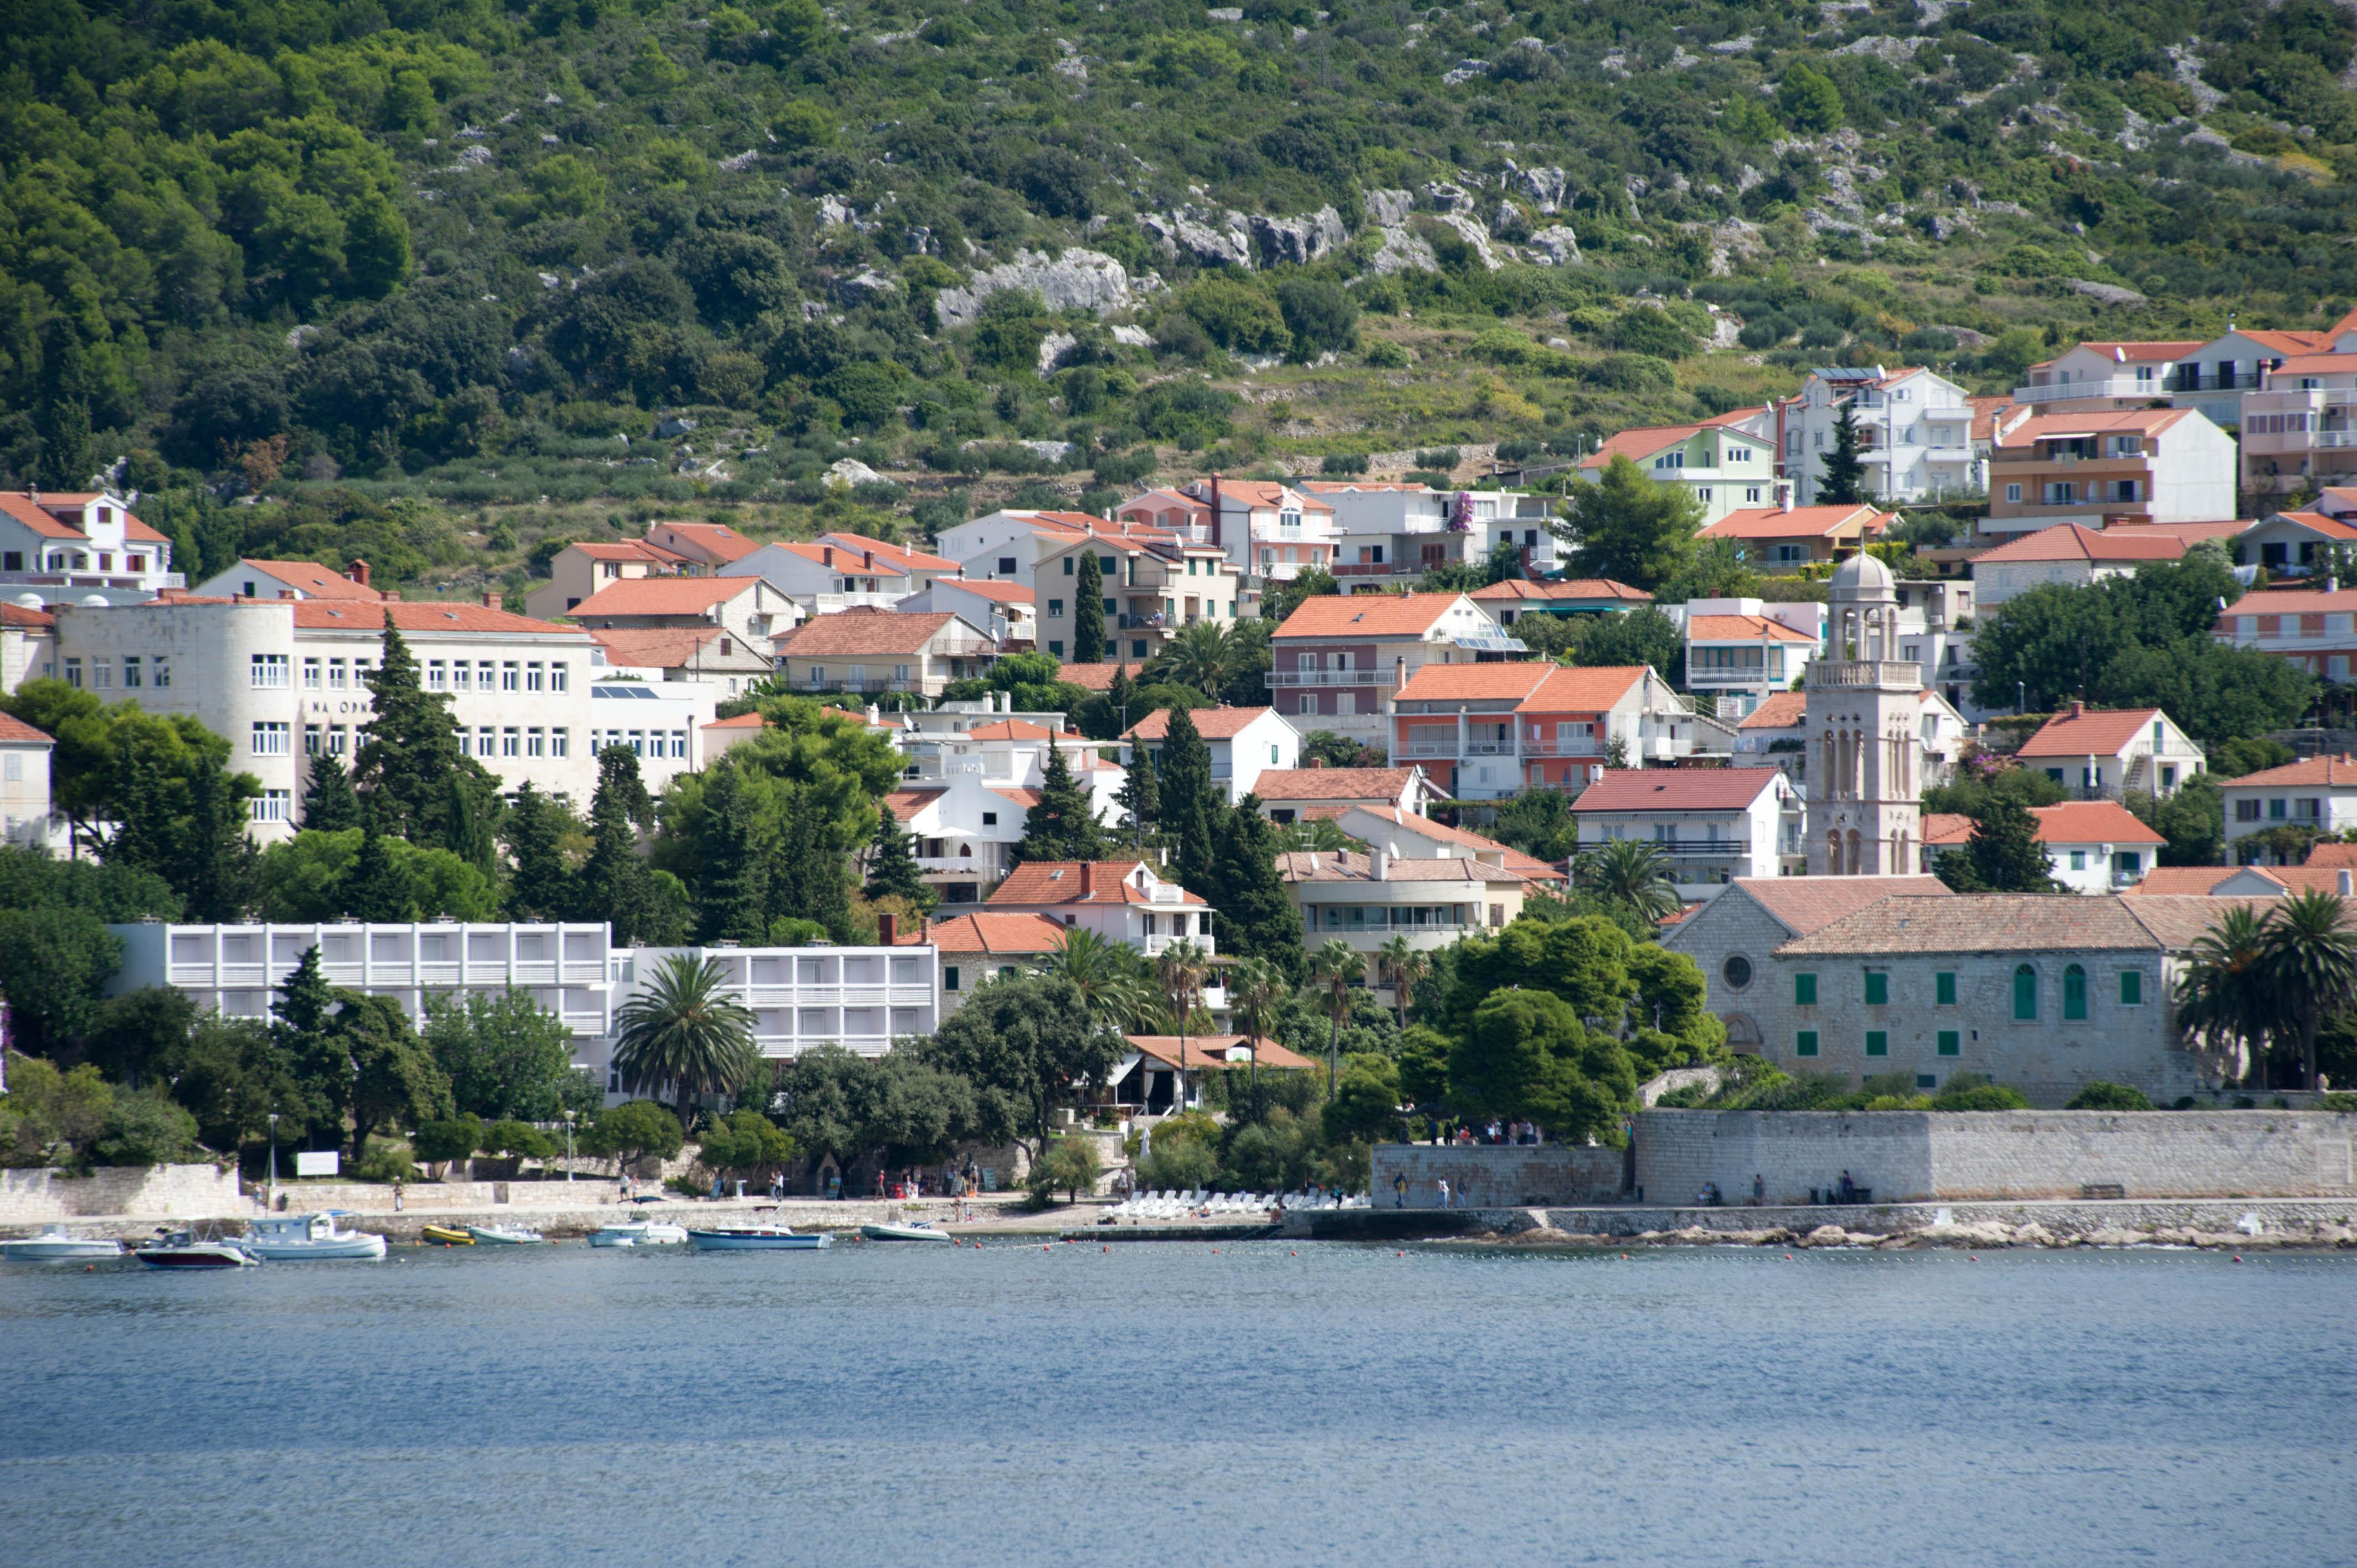 9850-Hvar (Dalmatie centrale)